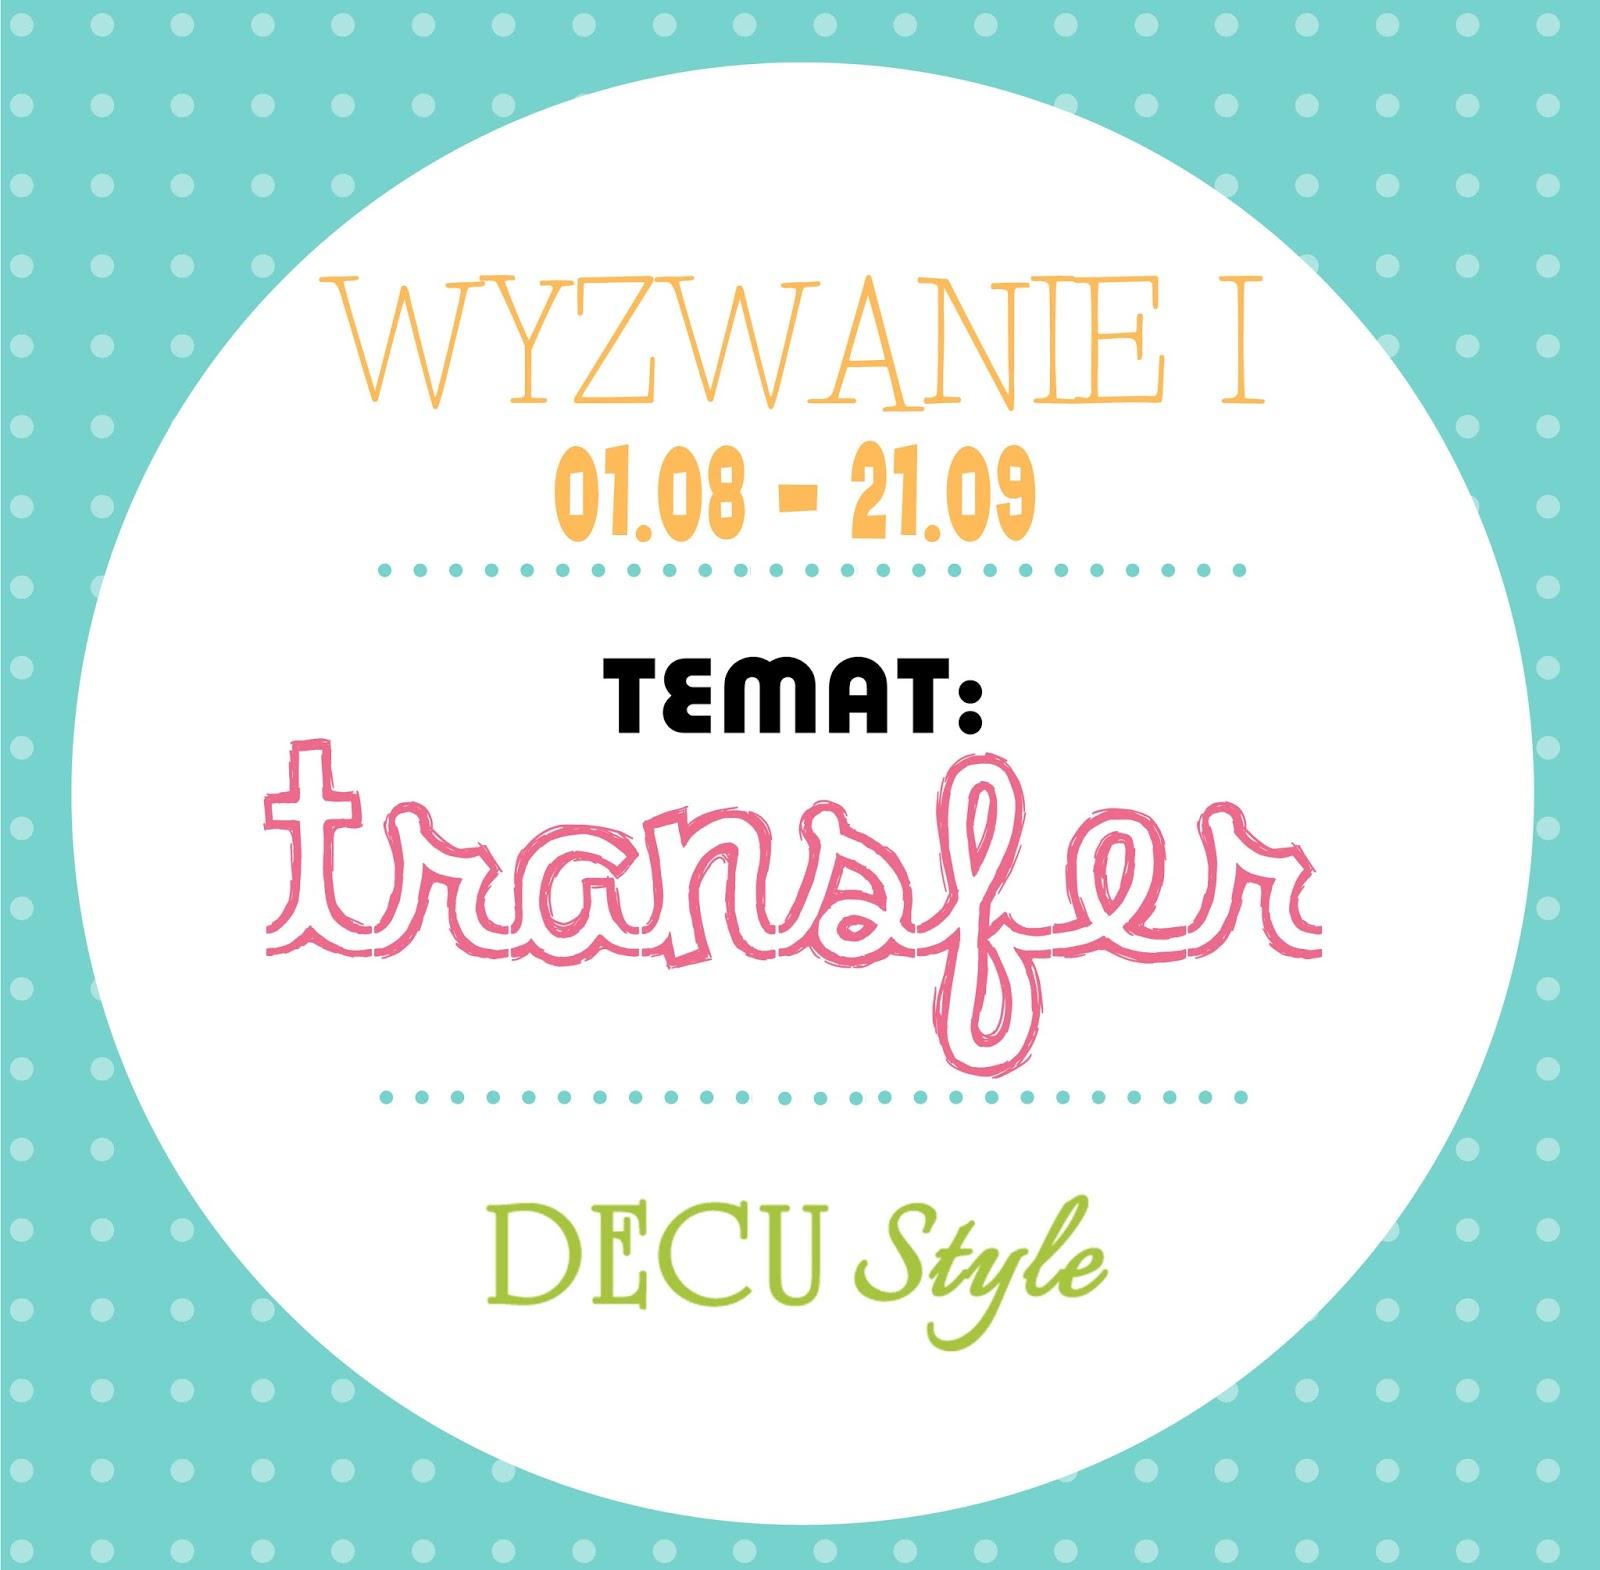 http://decustyle.blogspot.com/2014/08/wyzwanie-i-transfer.html